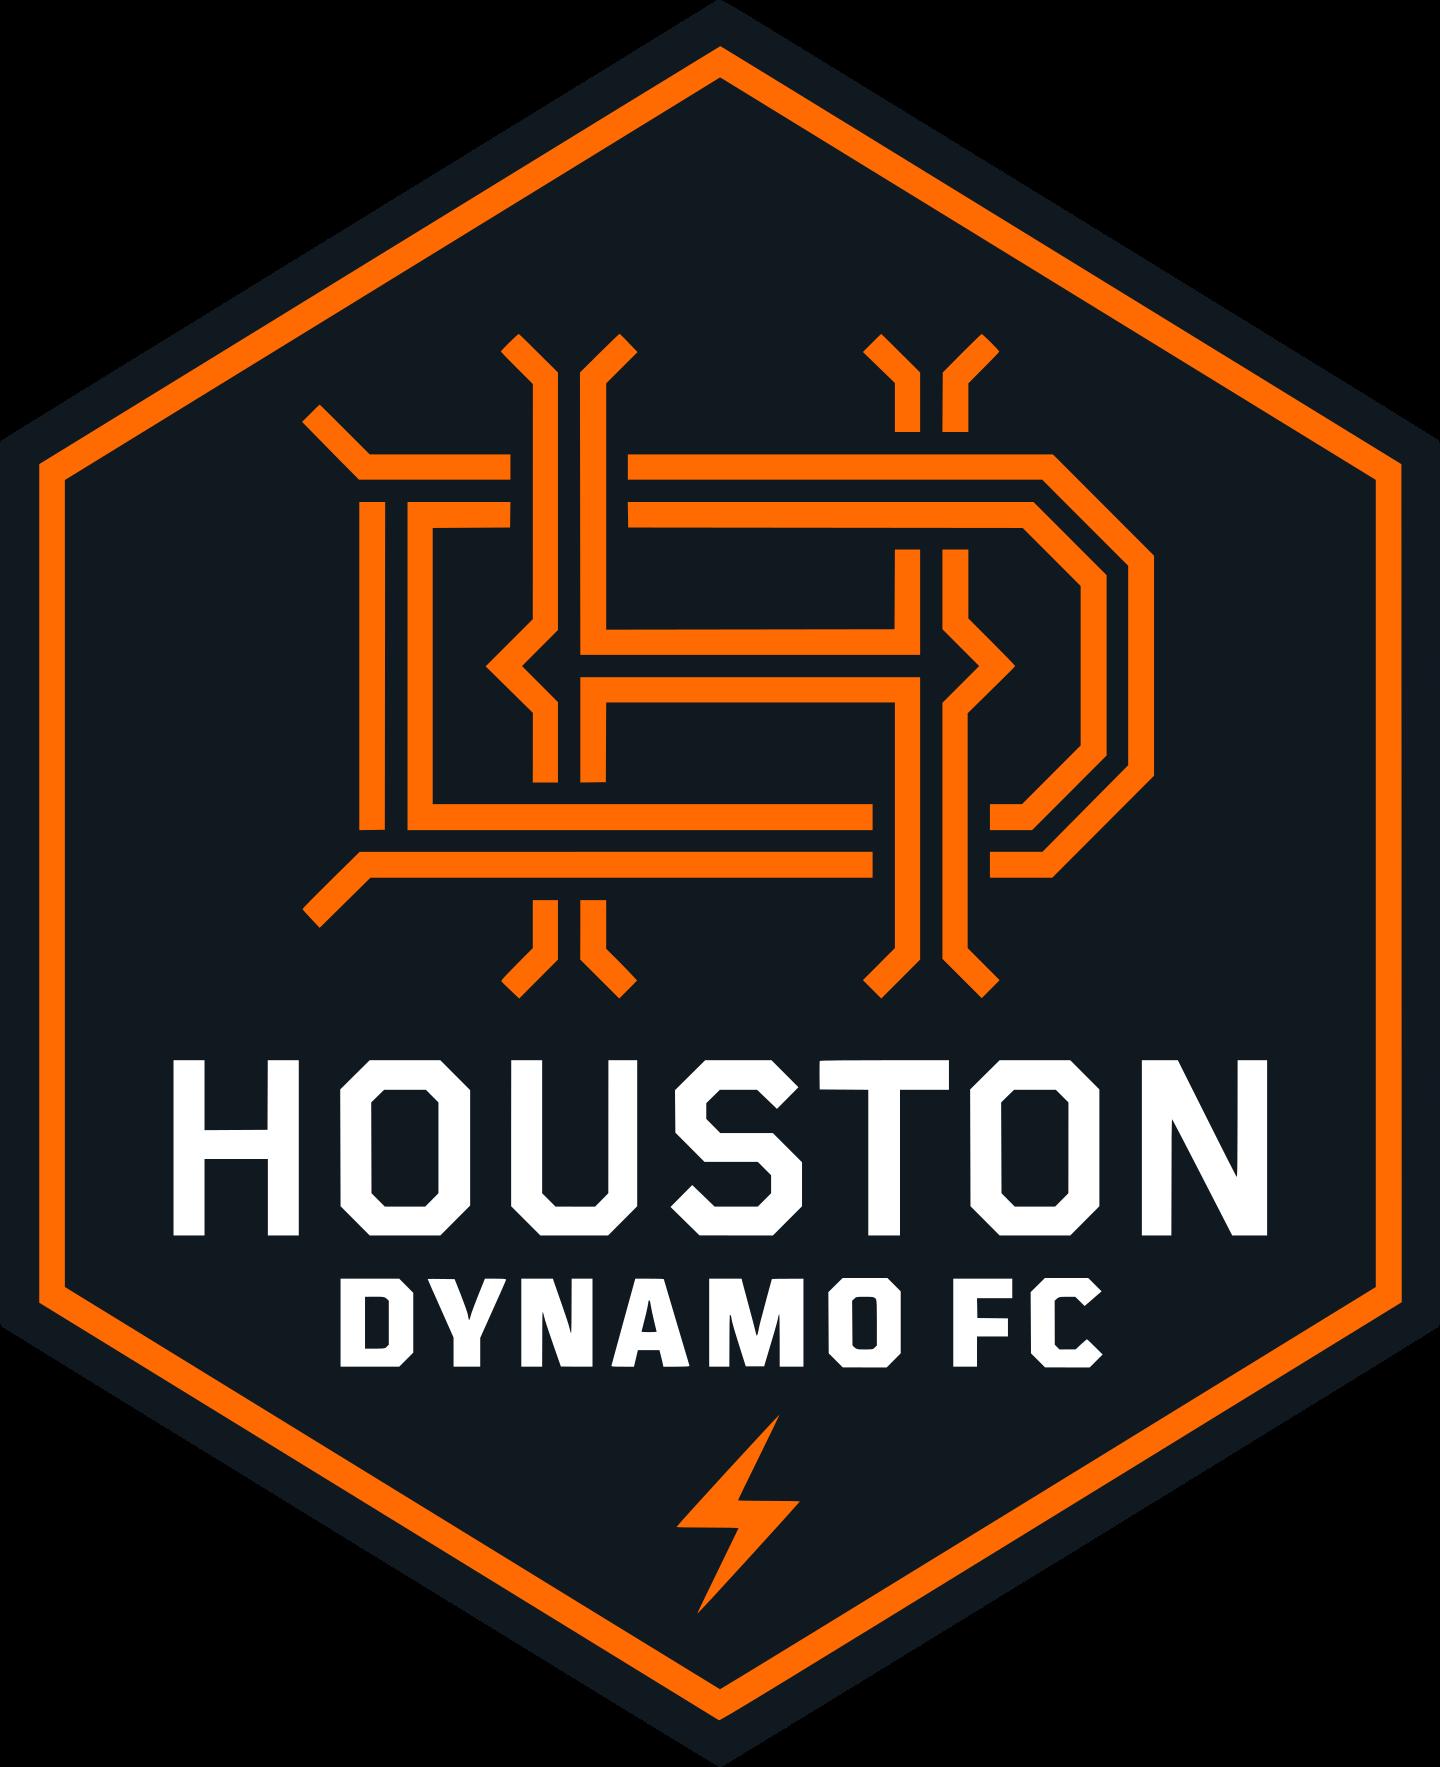 houston dynamo fc logo 2 - Houston Dynamo Logo